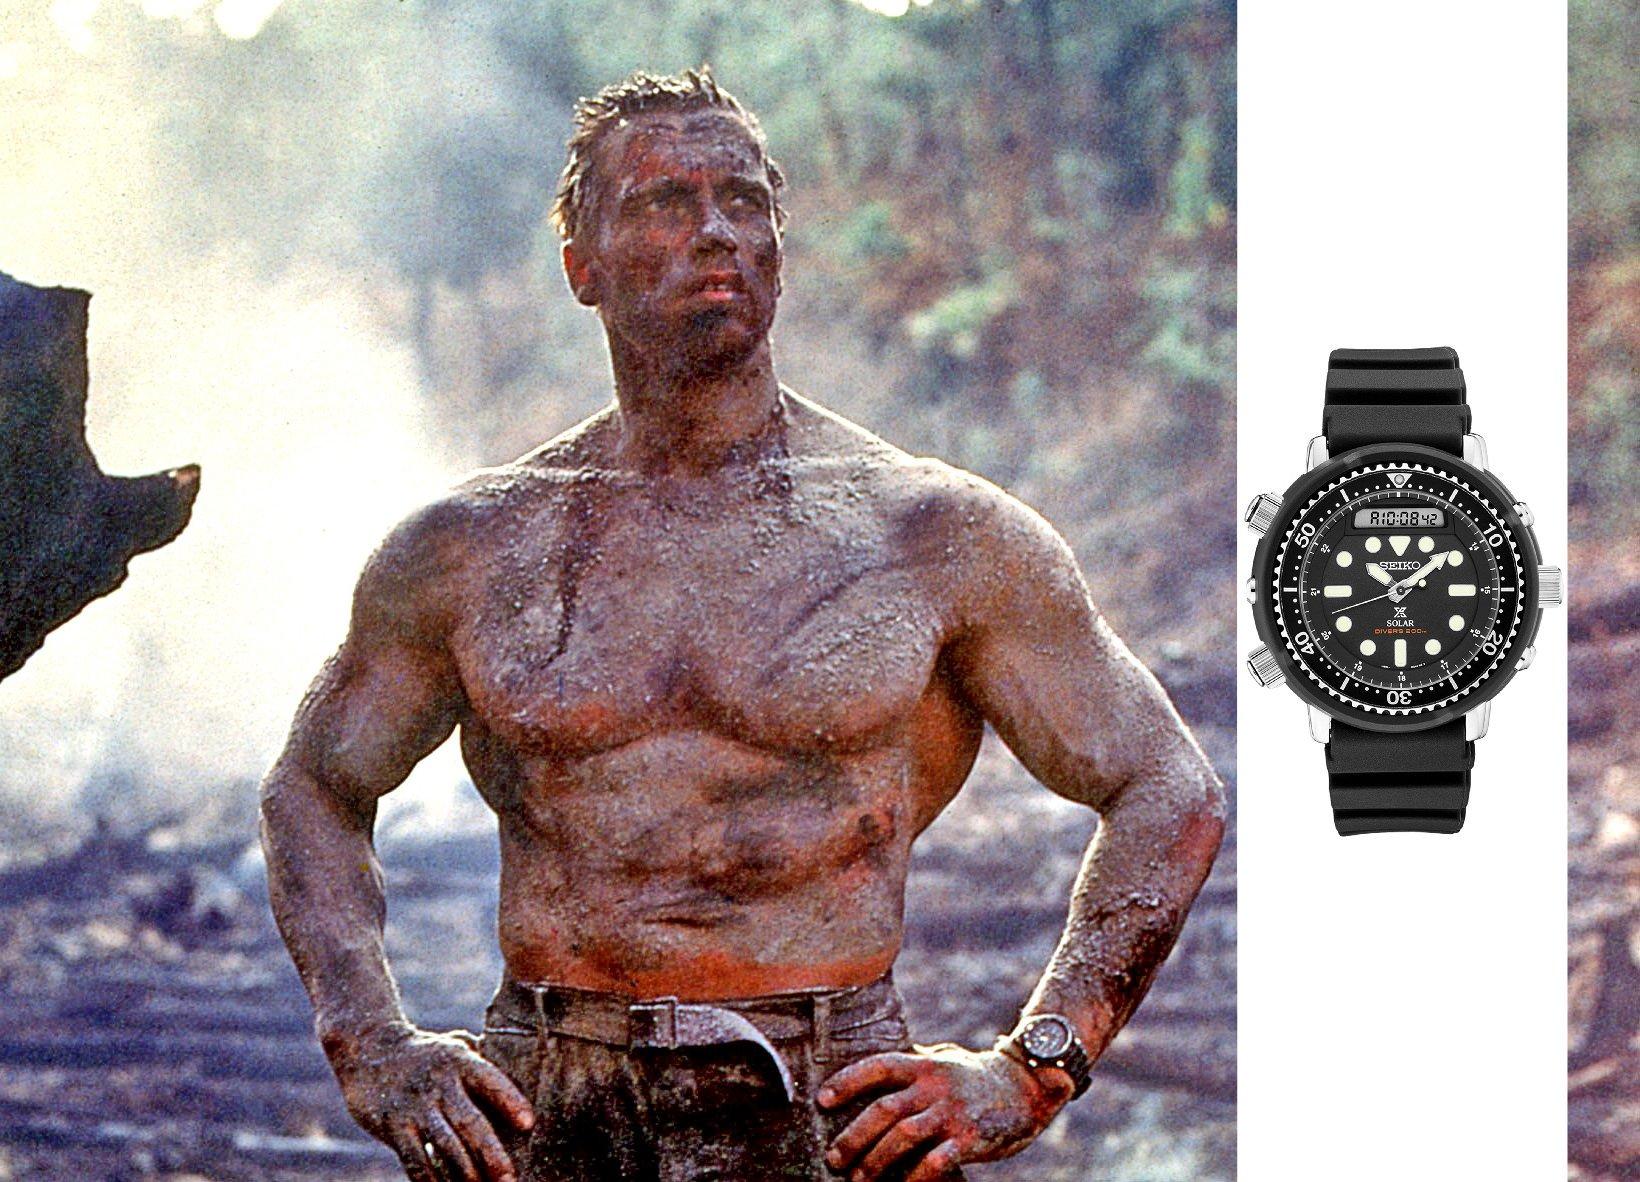 Predator Watch